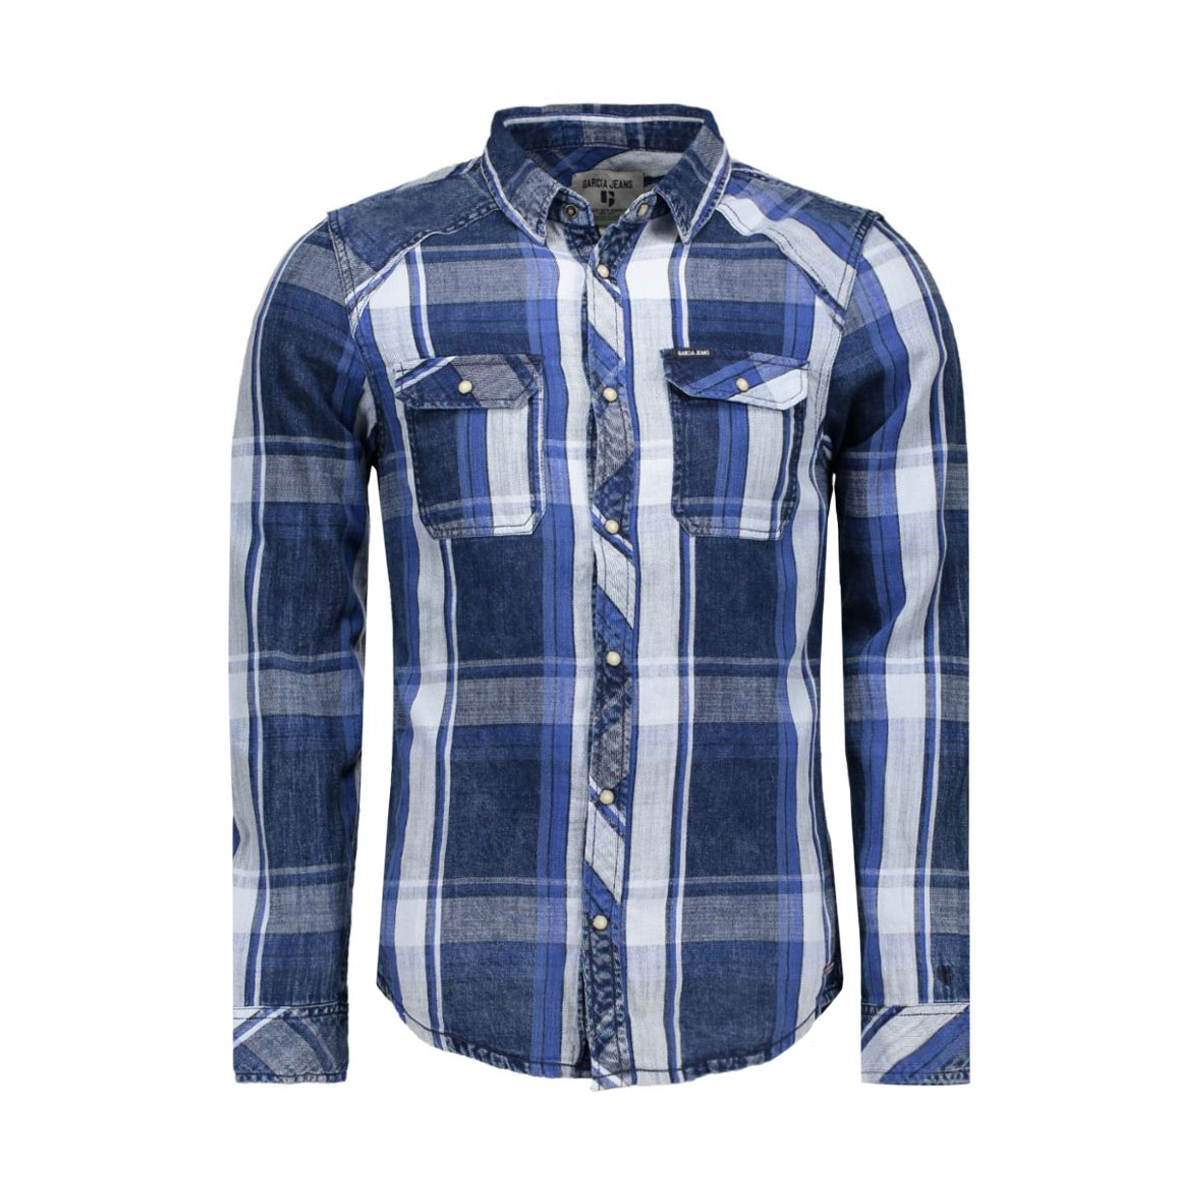 t61234 garcia overhemd 1050 indigo